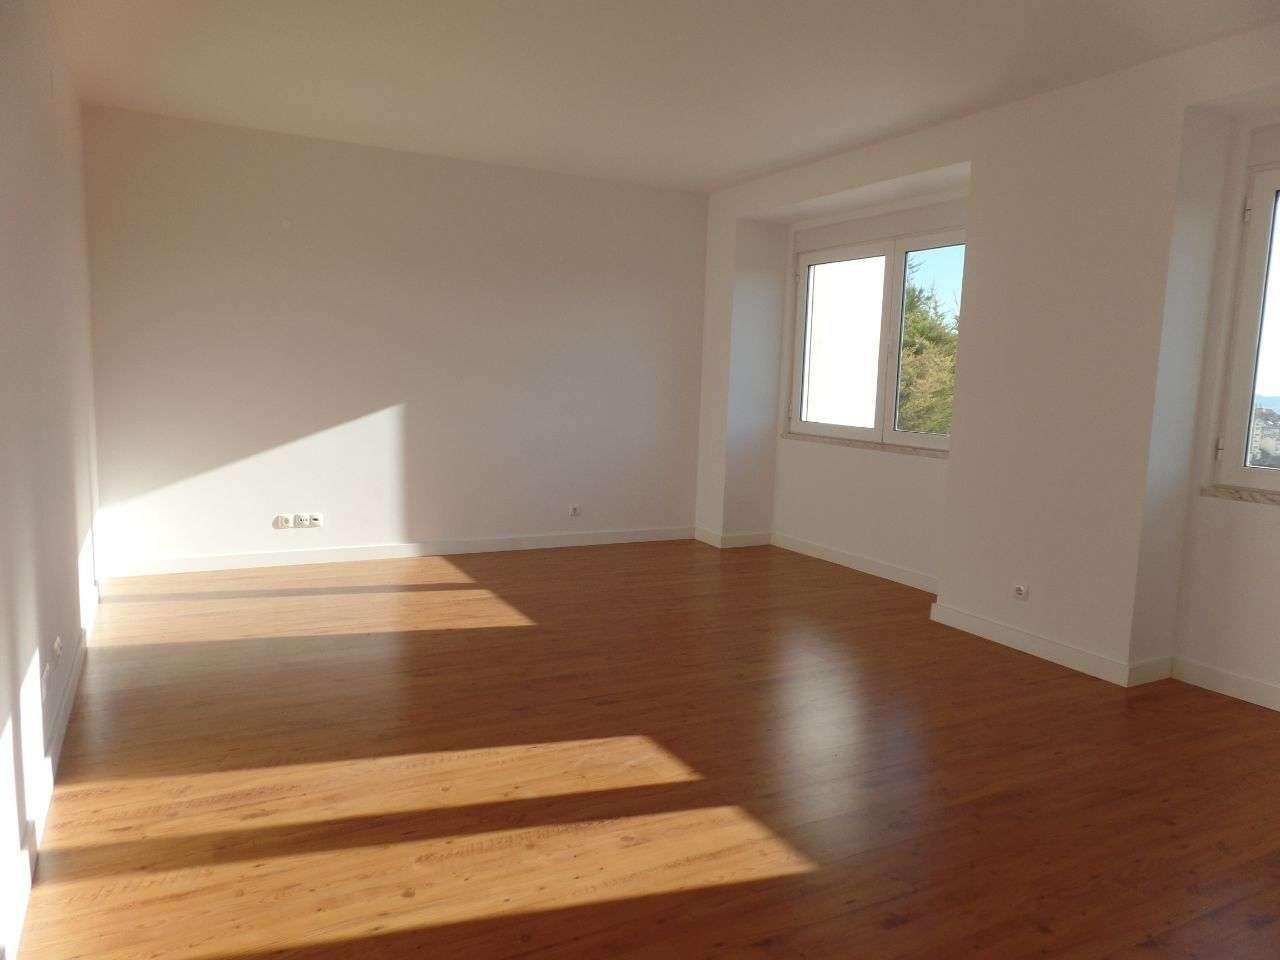 Apartamento para arrendar, Rua Francisco Rodrigues Lobo, Campolide - Foto 2